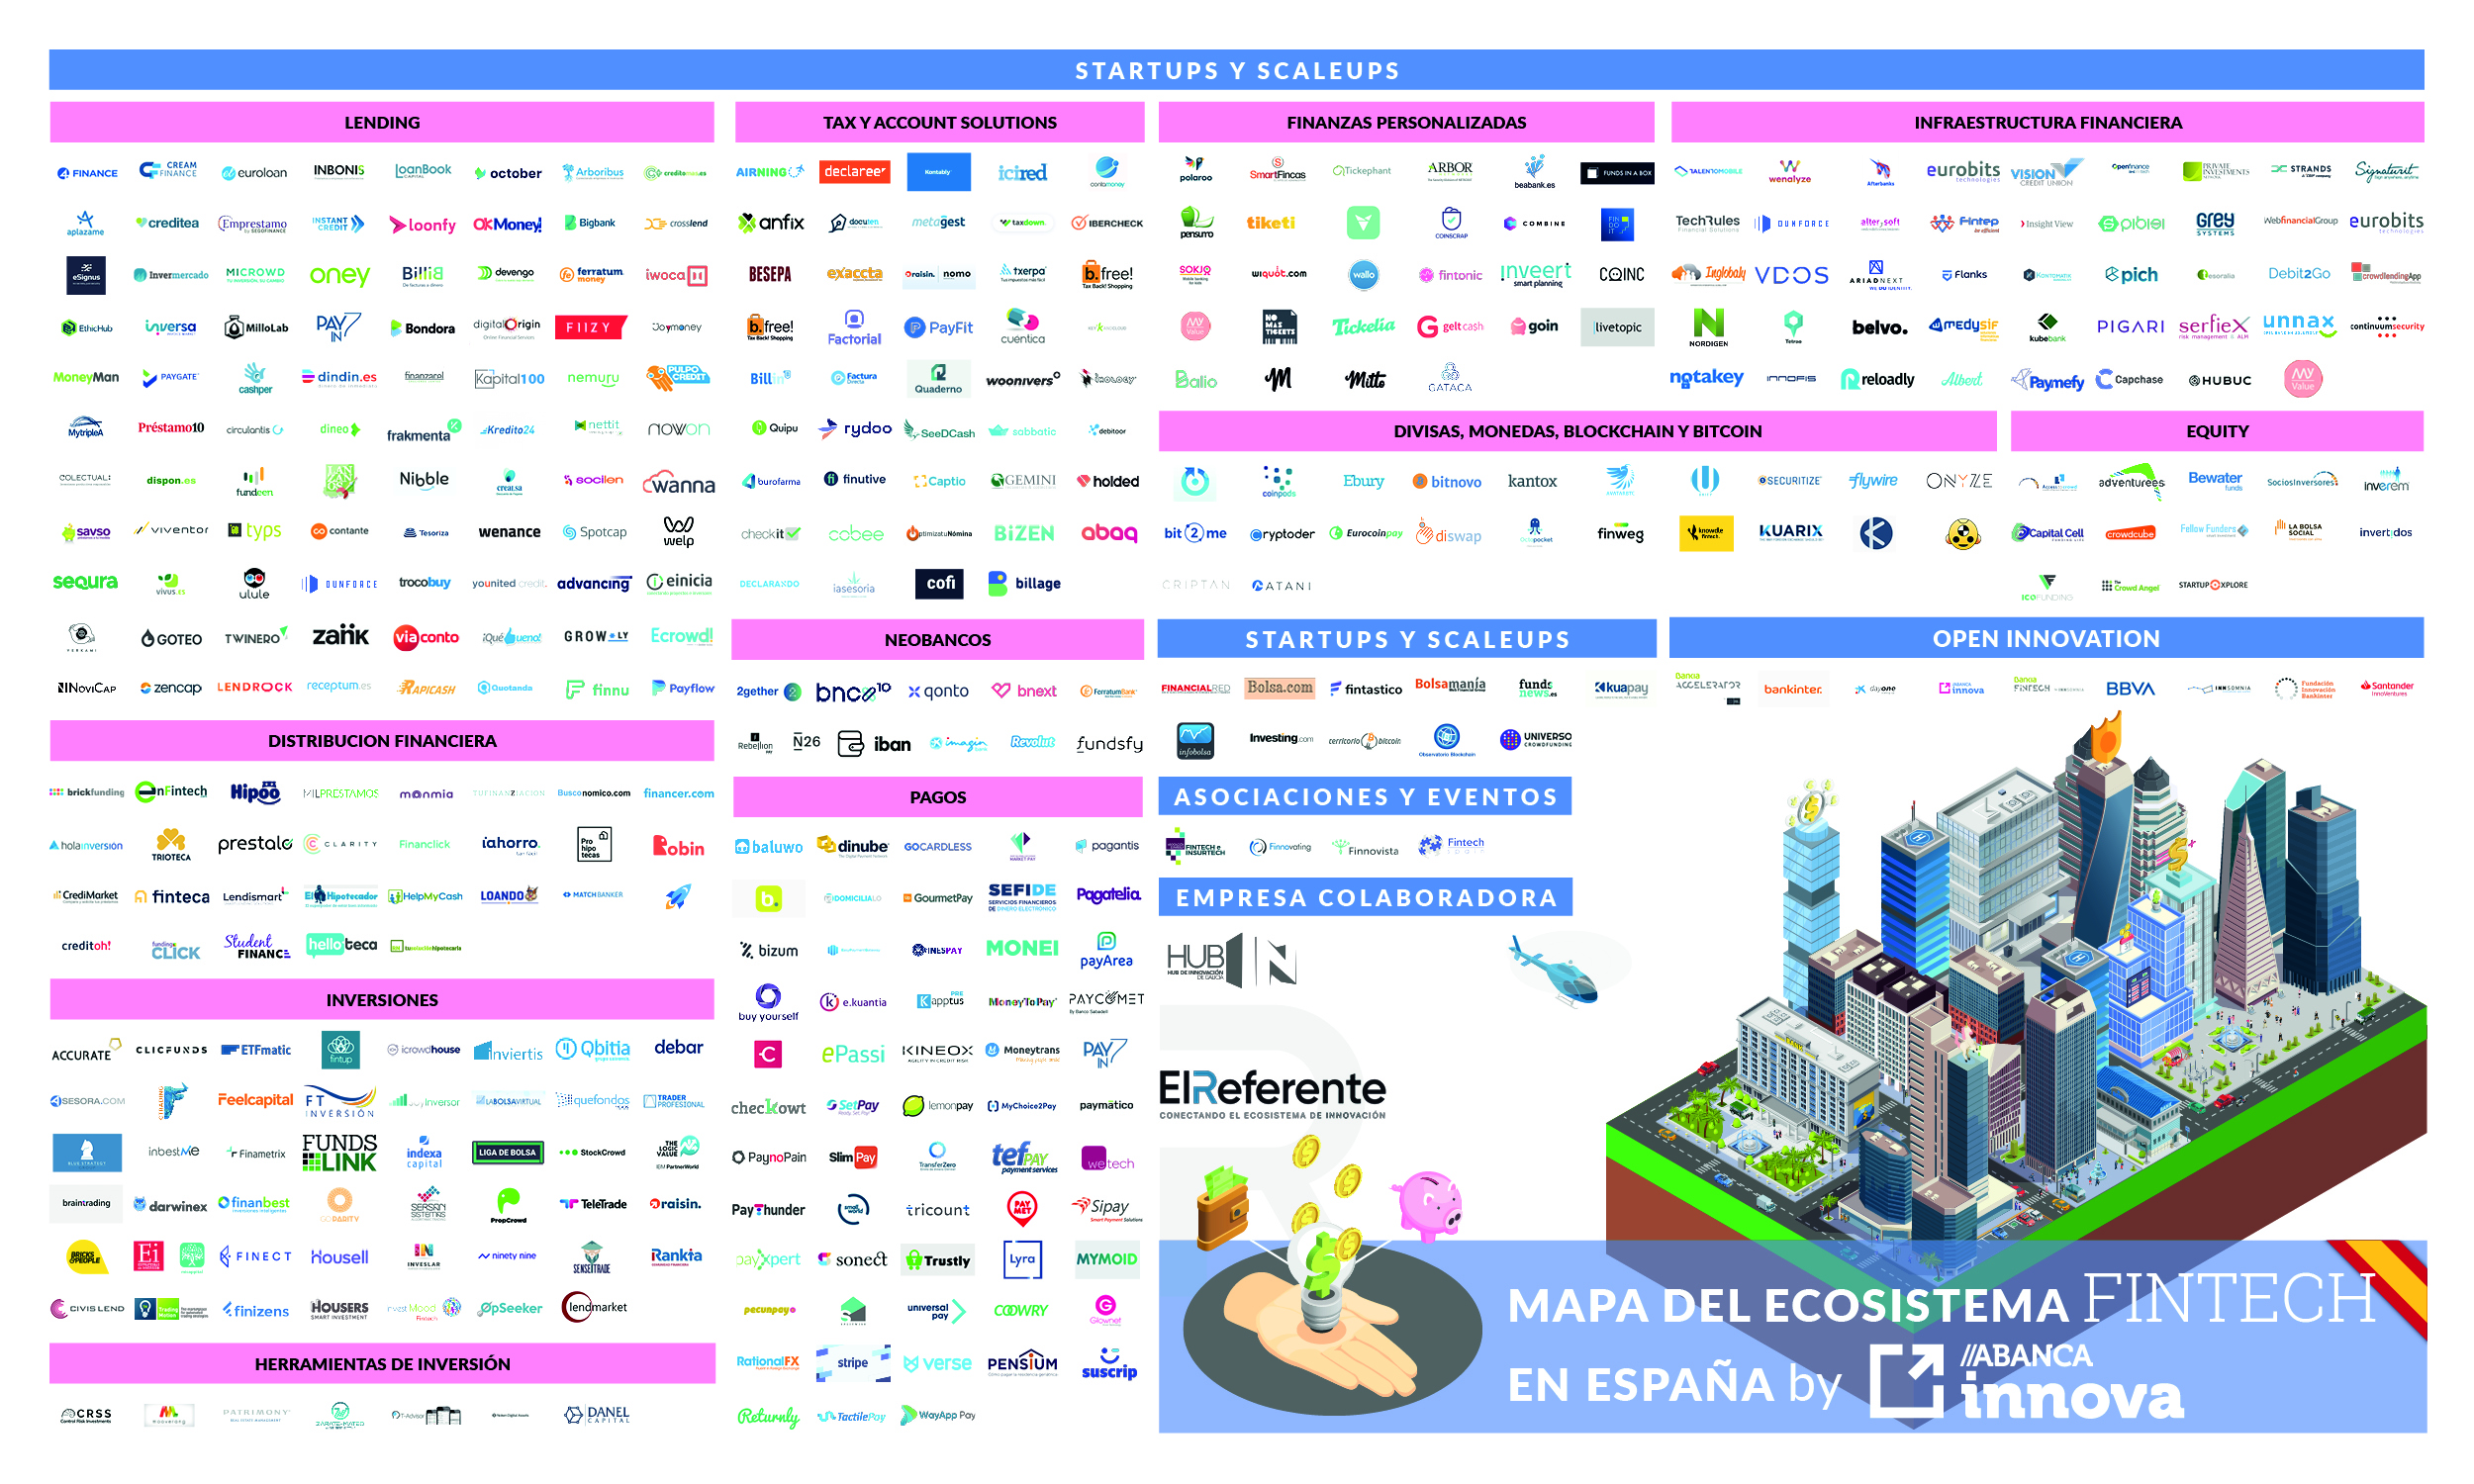 Mapa del sector Fintech en España en 2020